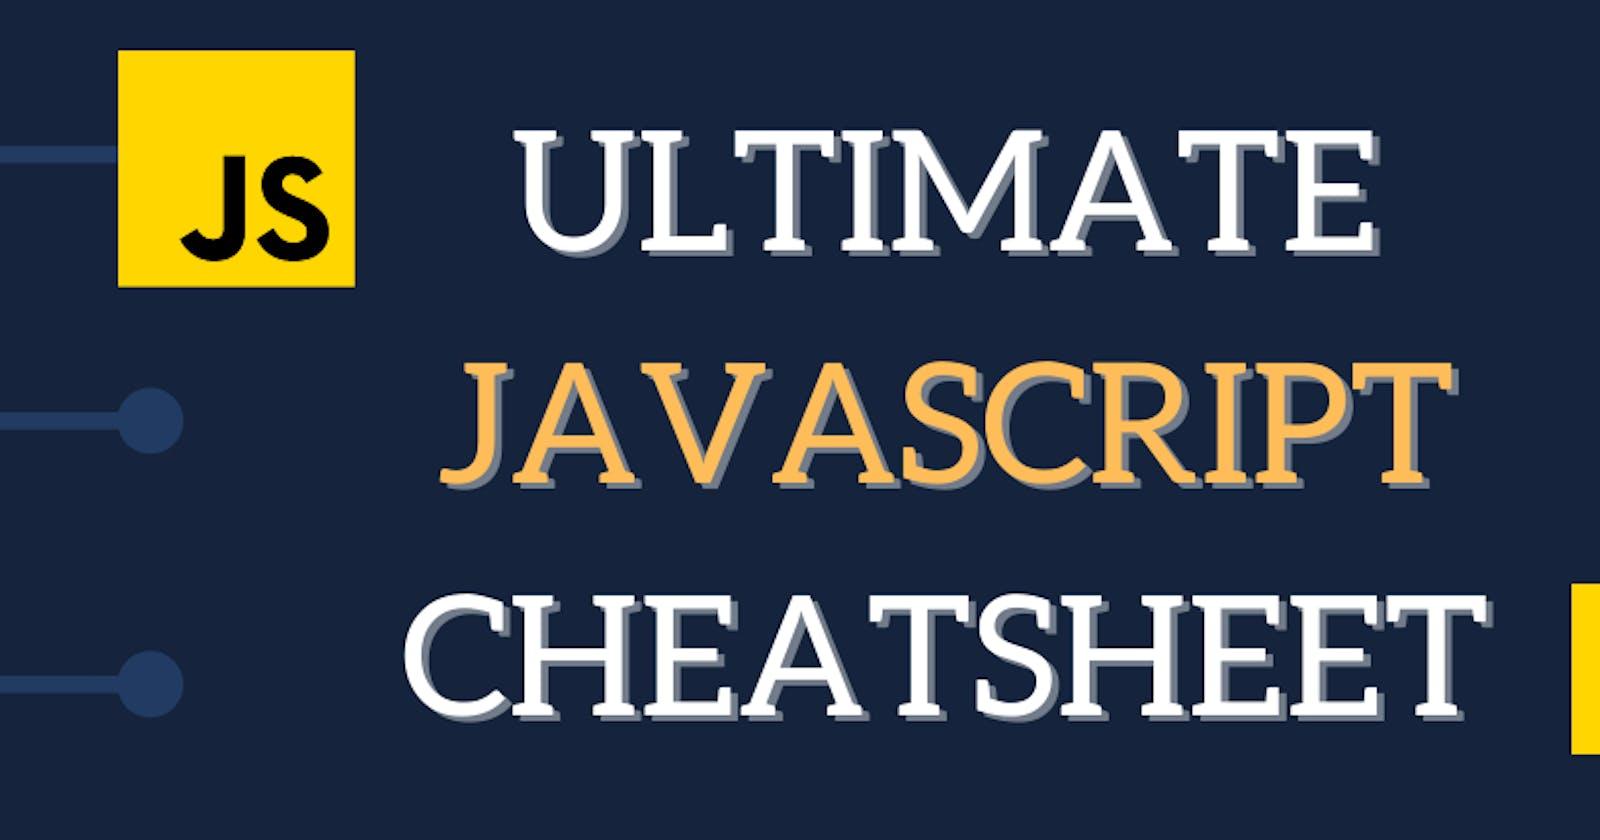 The ultimate JavaScript cheatsheet you'll ever need